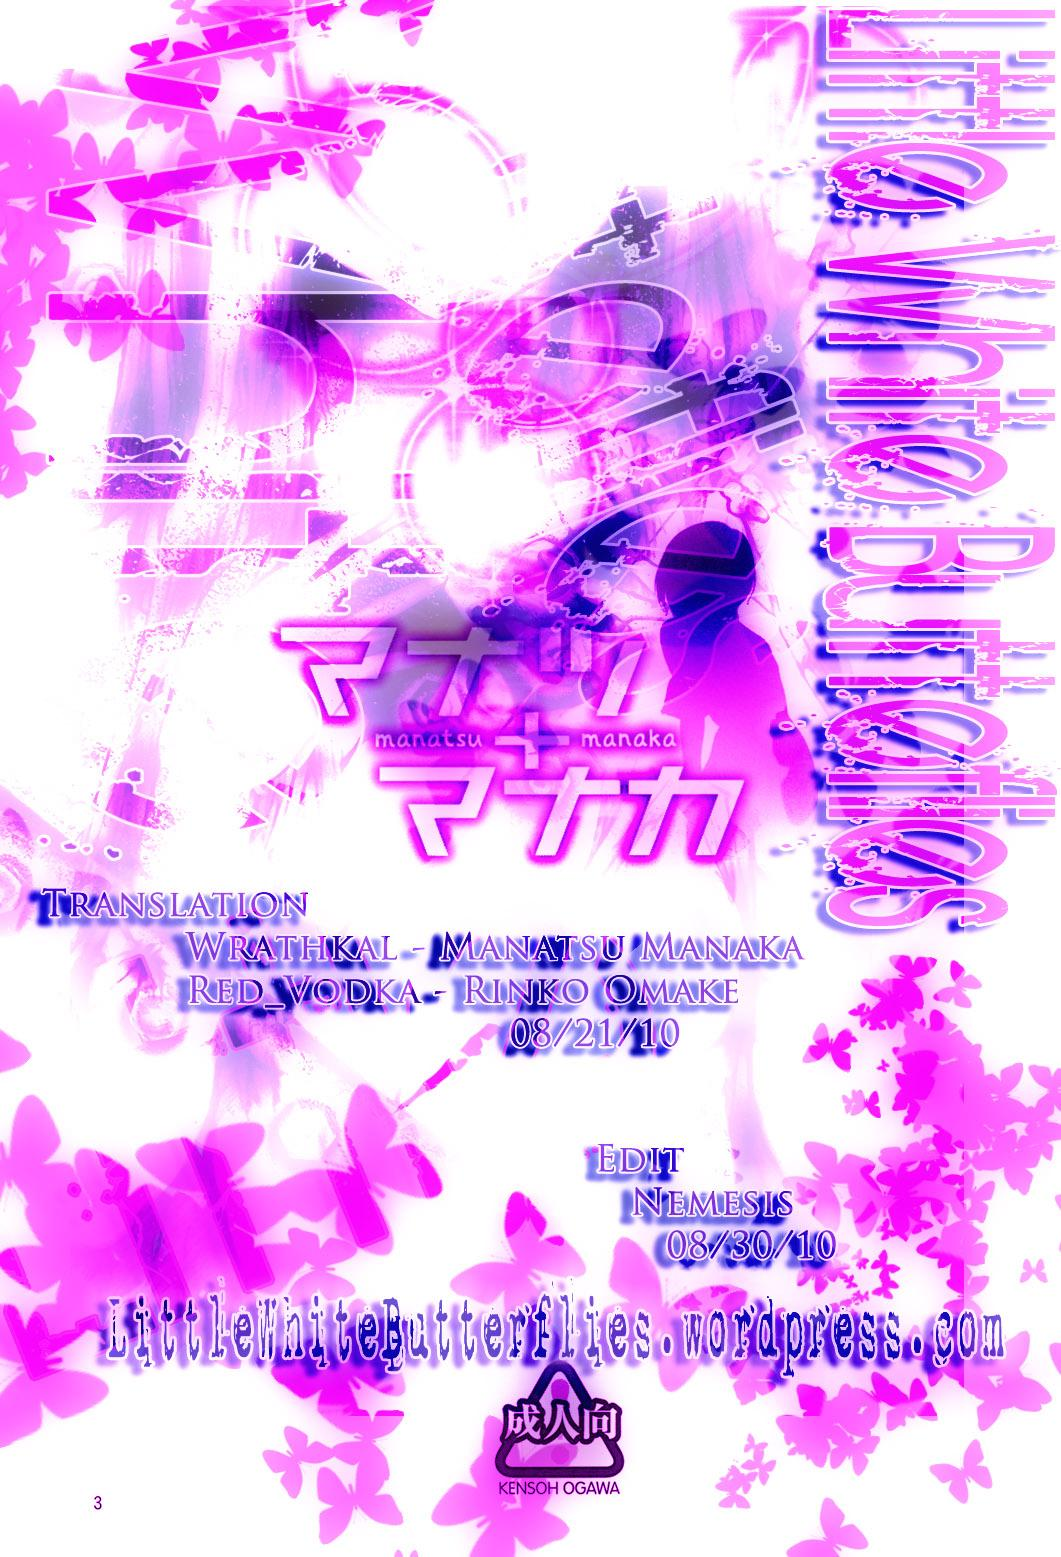 Manatsu + Manaka + Omake 1